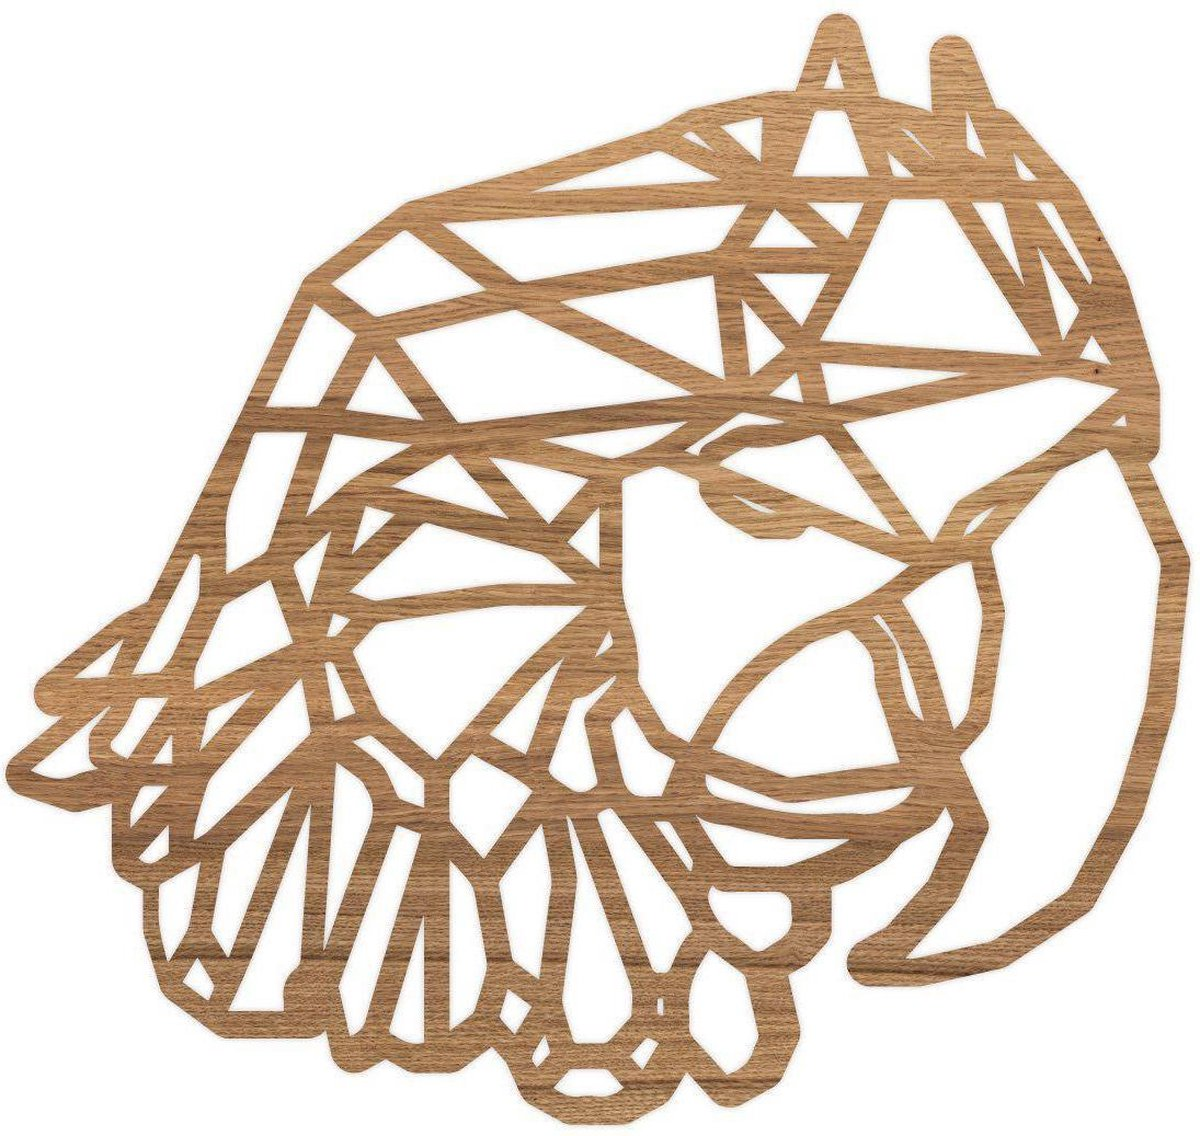 Geometrische Dieren Papegaai - Eiken hout - S (25x24 cm) - Cadeau - Kinderen - Geschenk - Woon decoratie - Woonkamer - Slaapkamer - Geometrische wanddecoratie